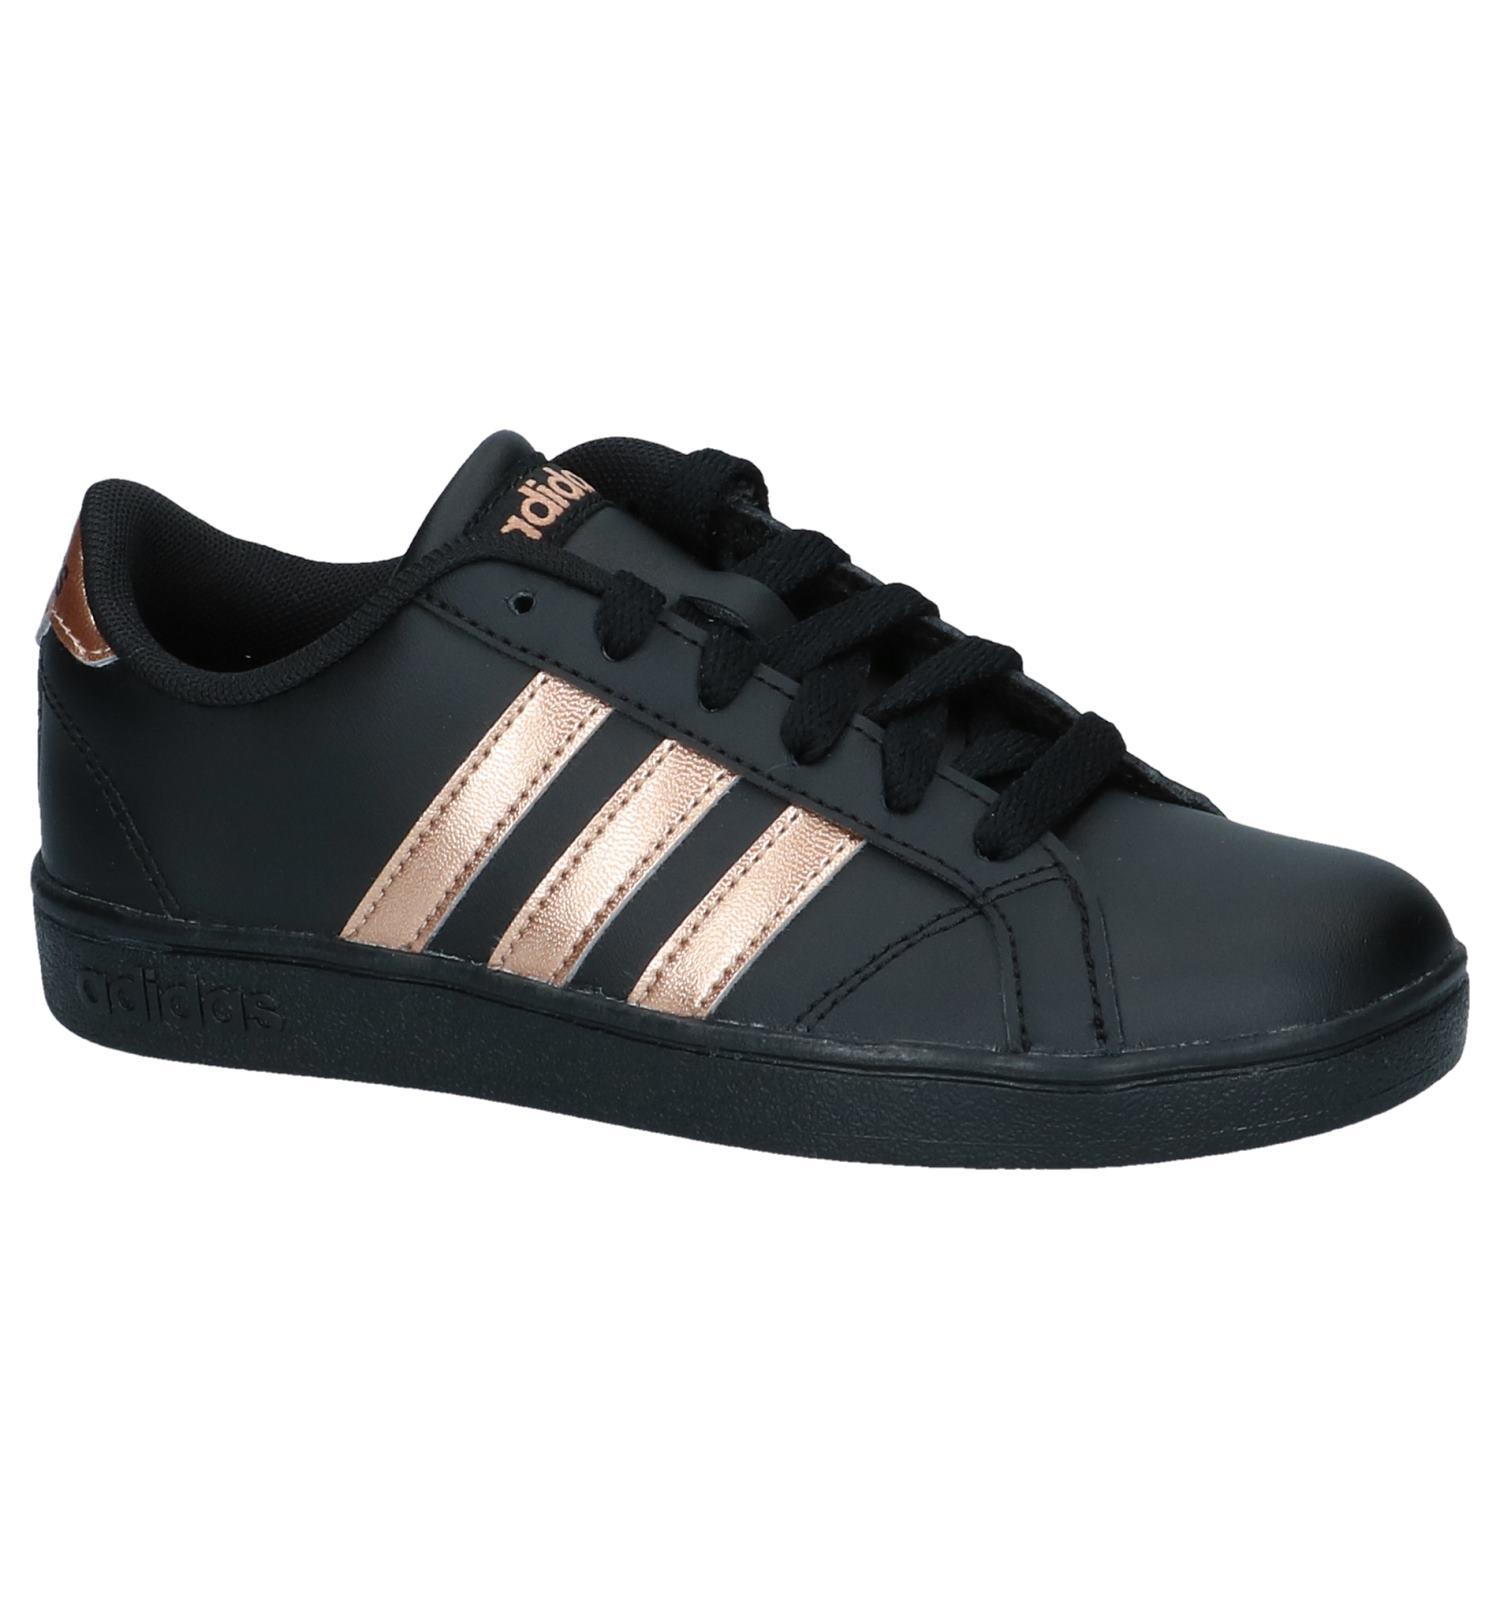 01f1c7360f9 Zwarte Sneakers adidas Baseline K | TORFS.BE | Gratis verzend en retour